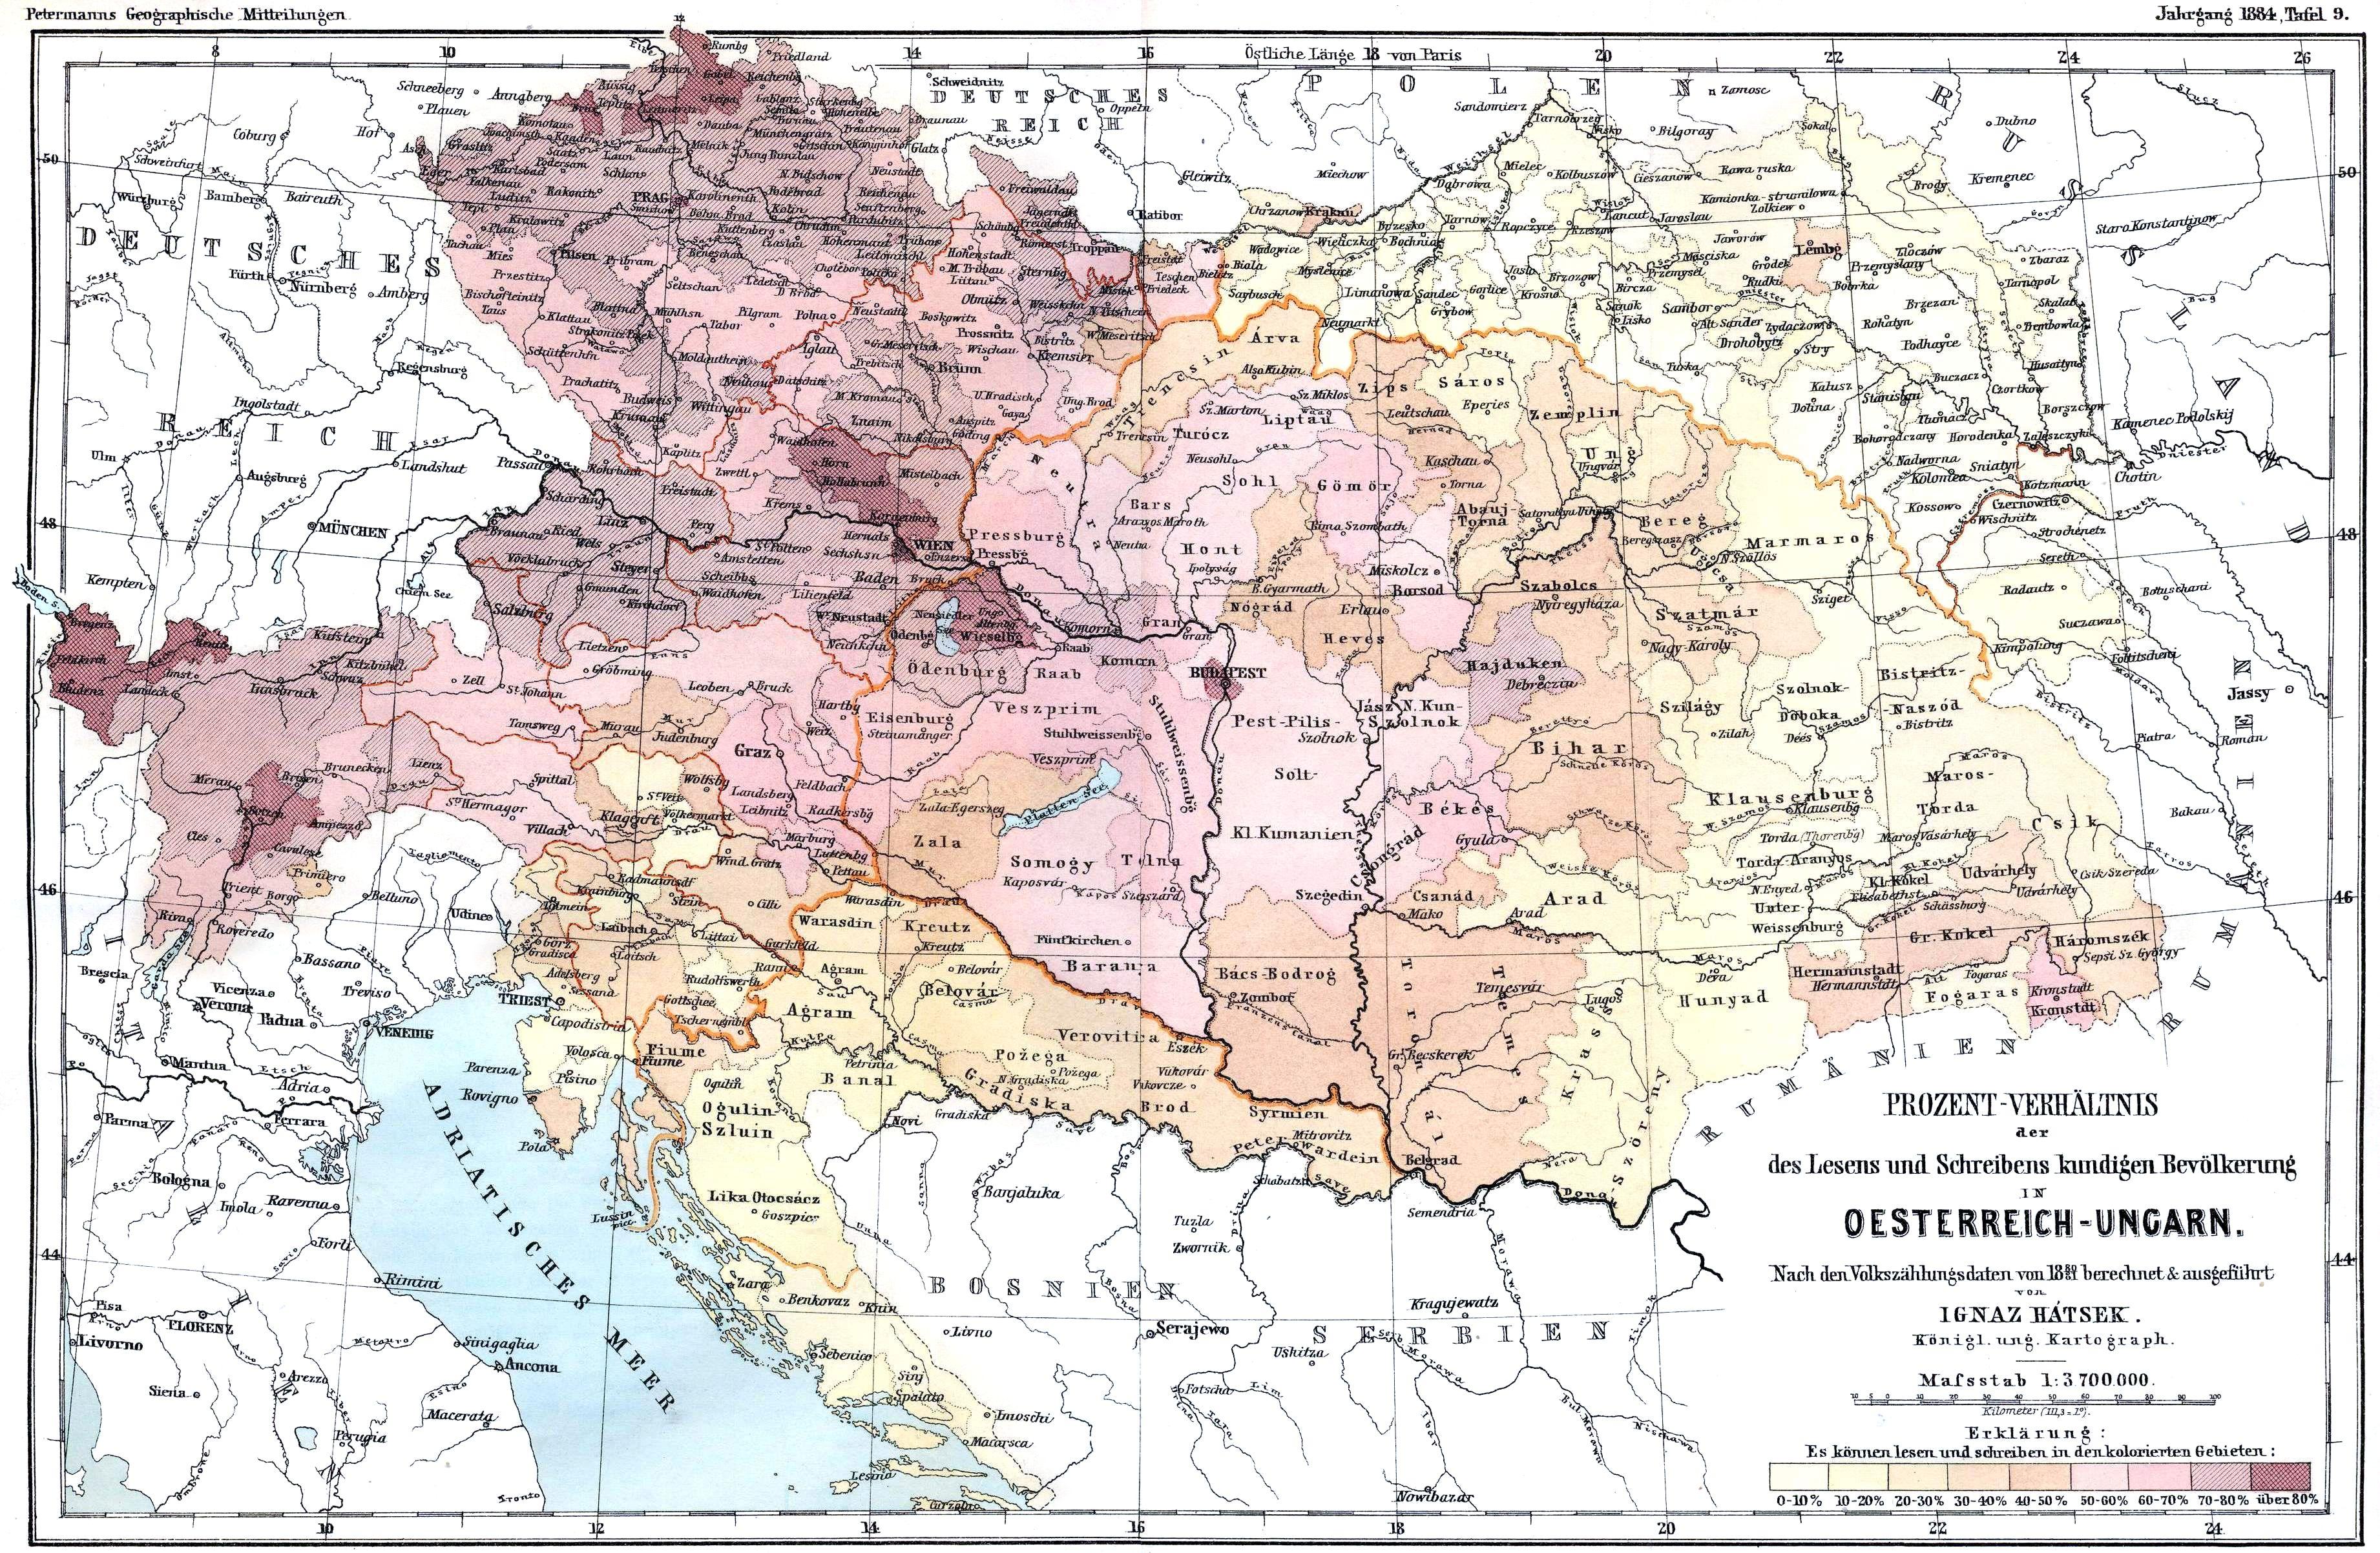 Literacy in Austria-Hungary (census 1880)